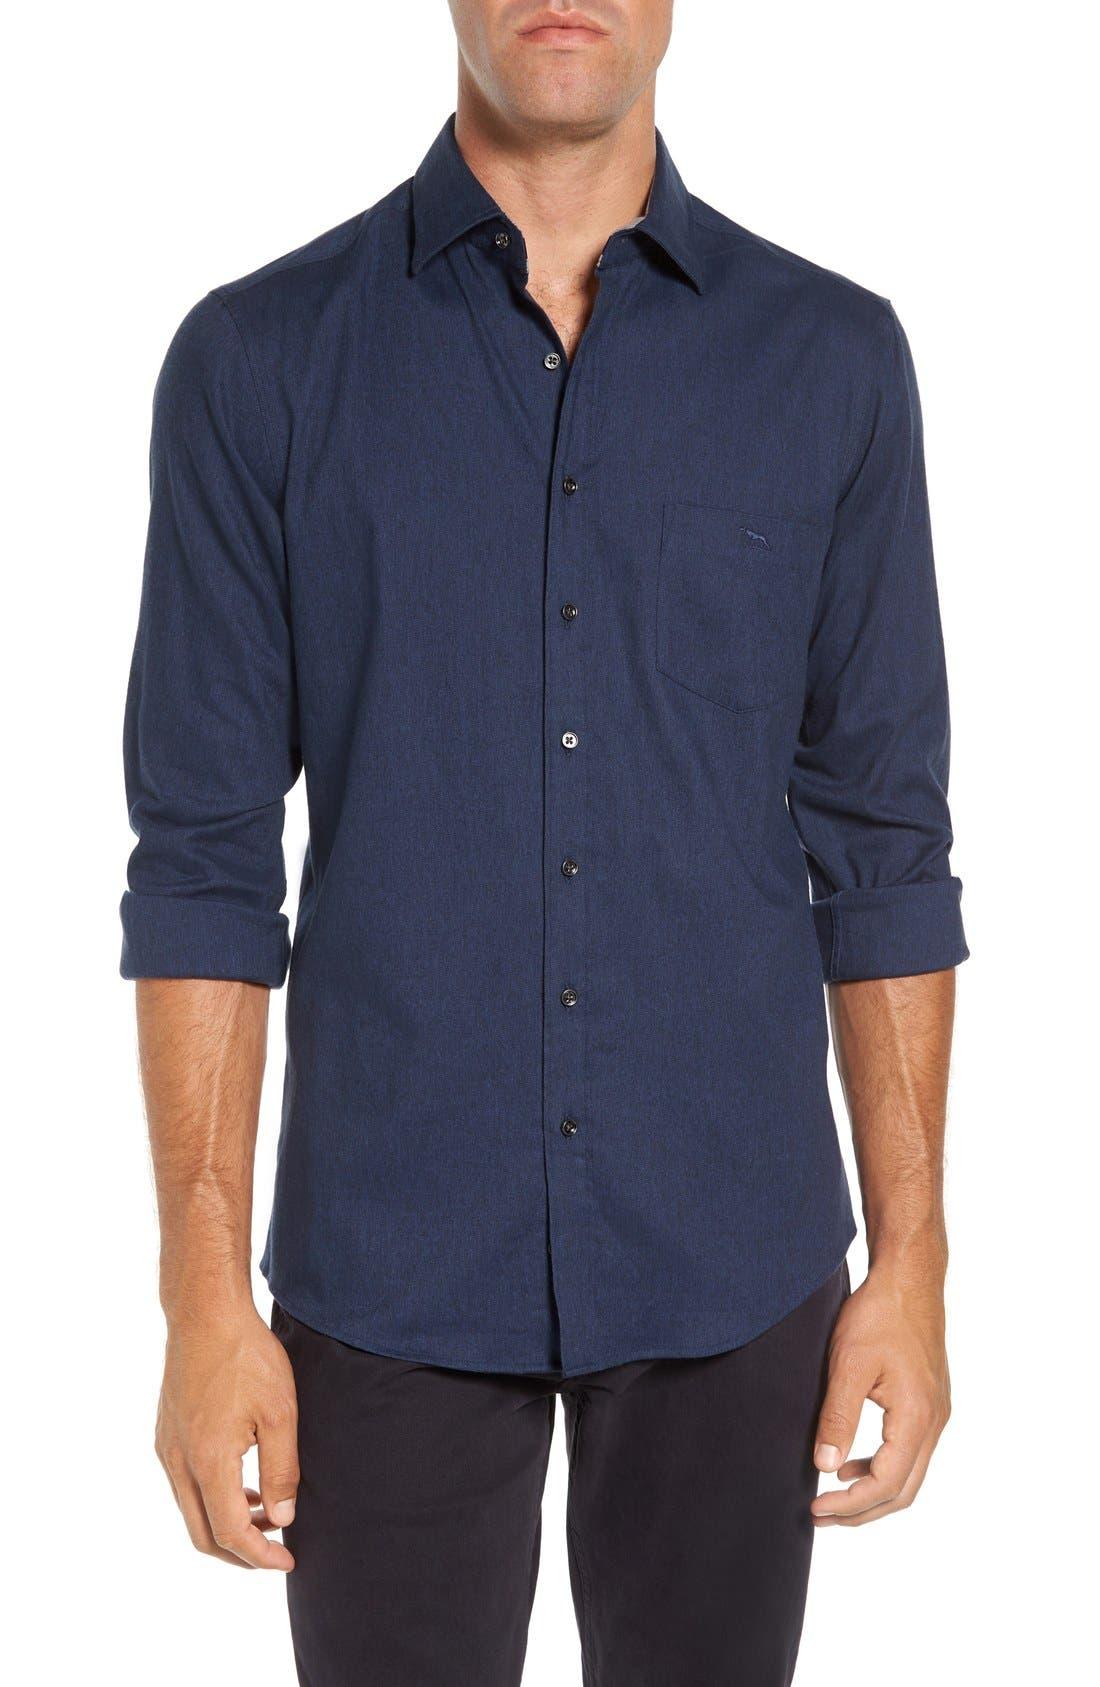 'Sinclair' Trim Fit Brushed Twill Sport Shirt,                             Main thumbnail 1, color,                             Indigo